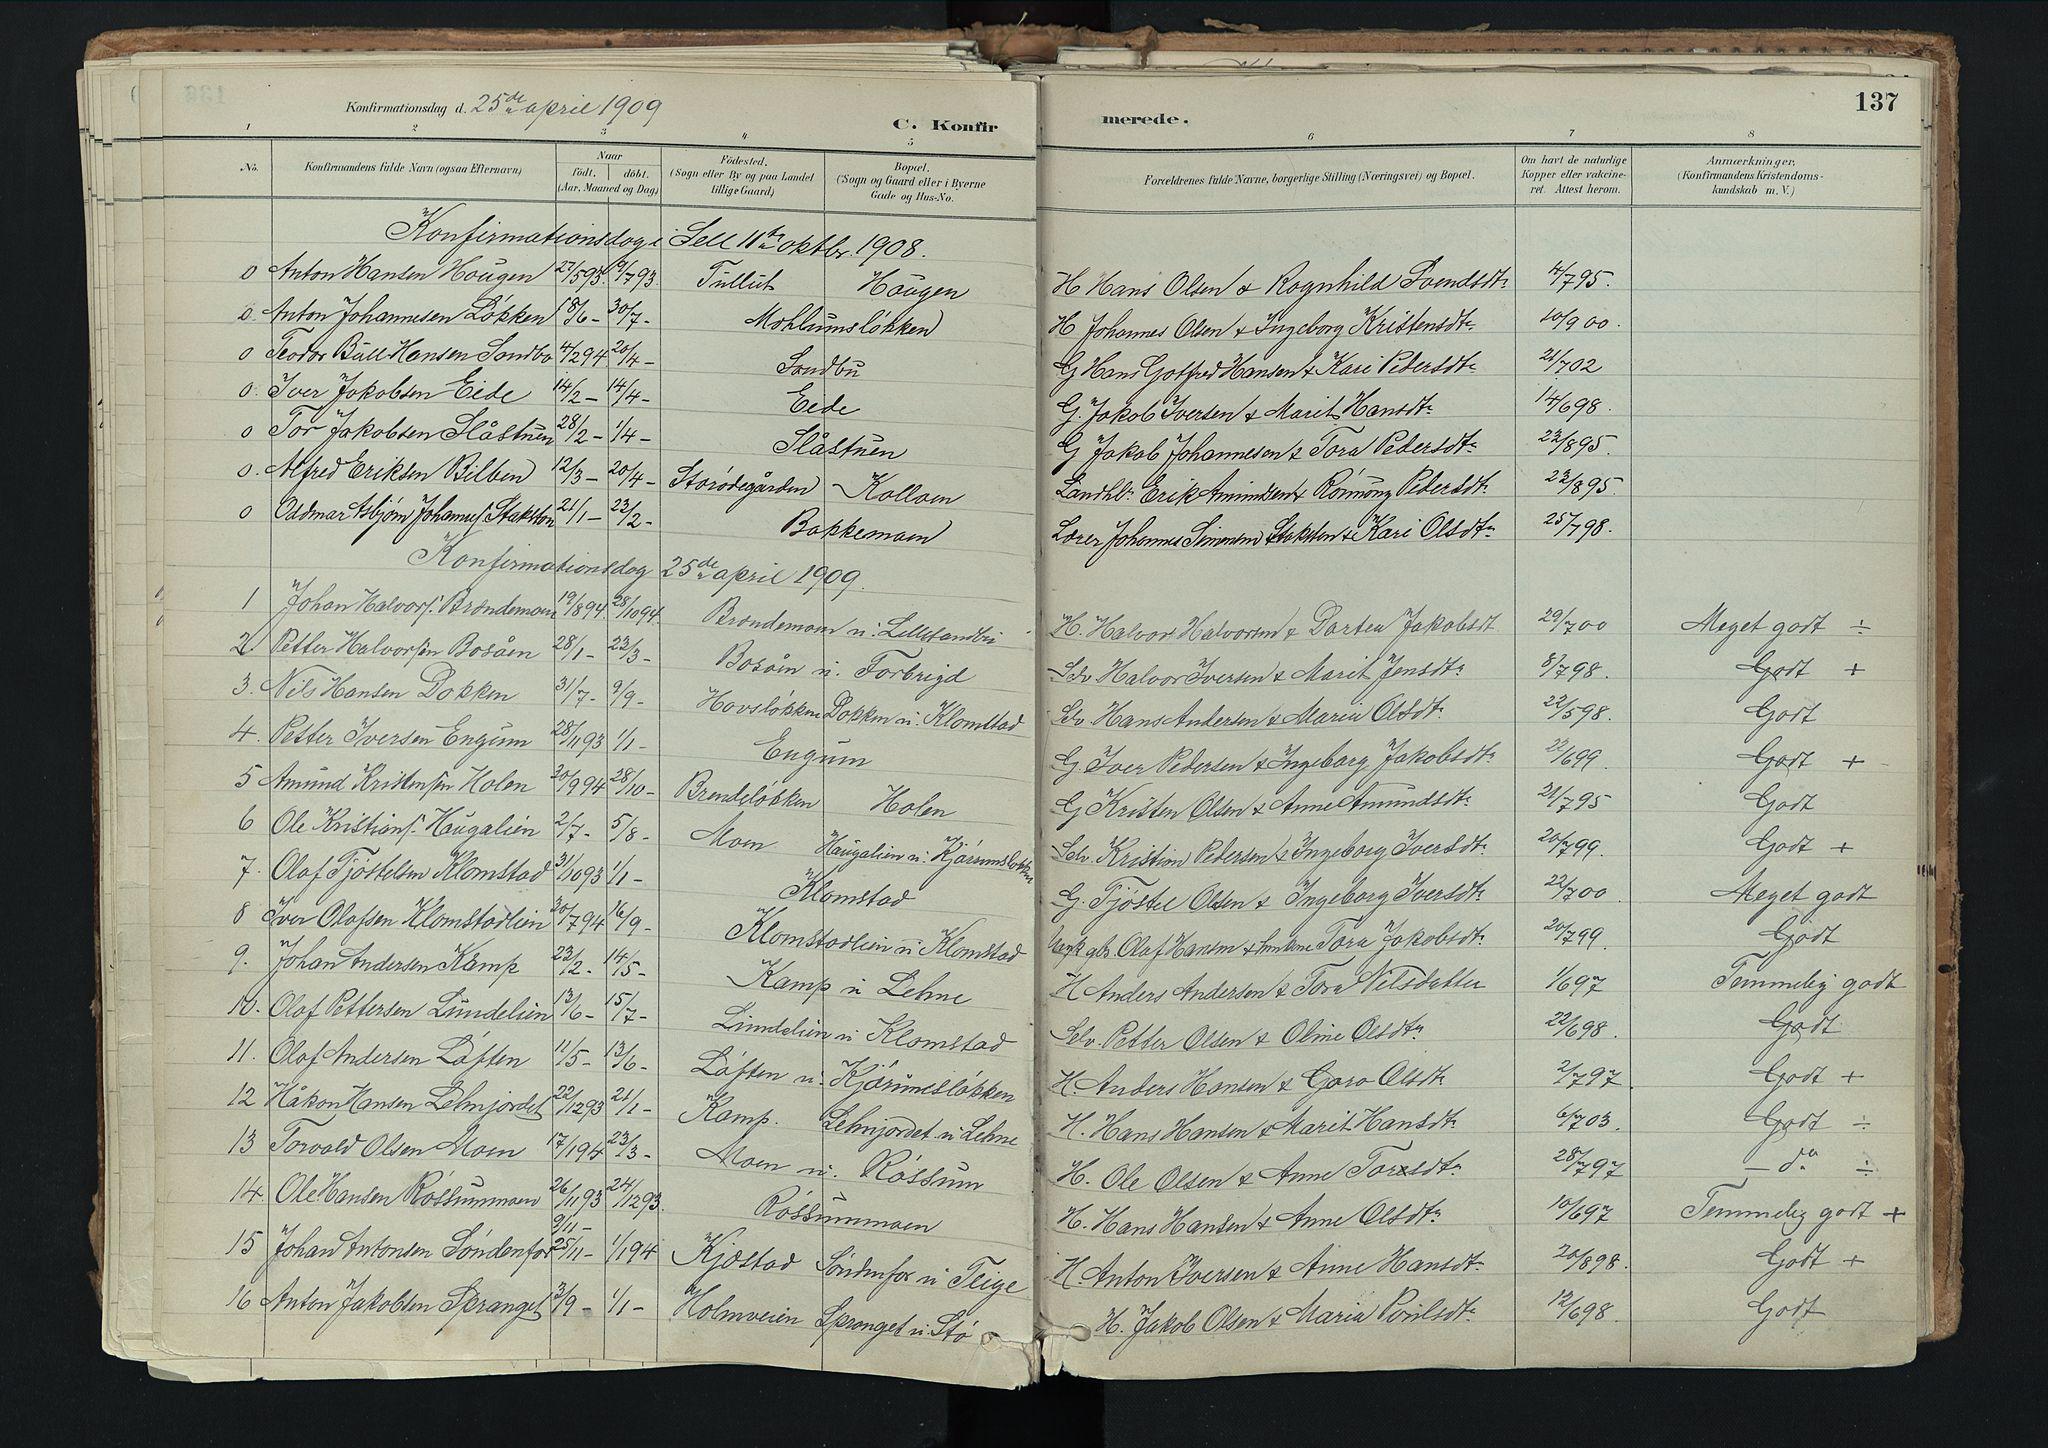 SAH, Nord-Fron prestekontor, Ministerialbok nr. 3, 1884-1914, s. 137